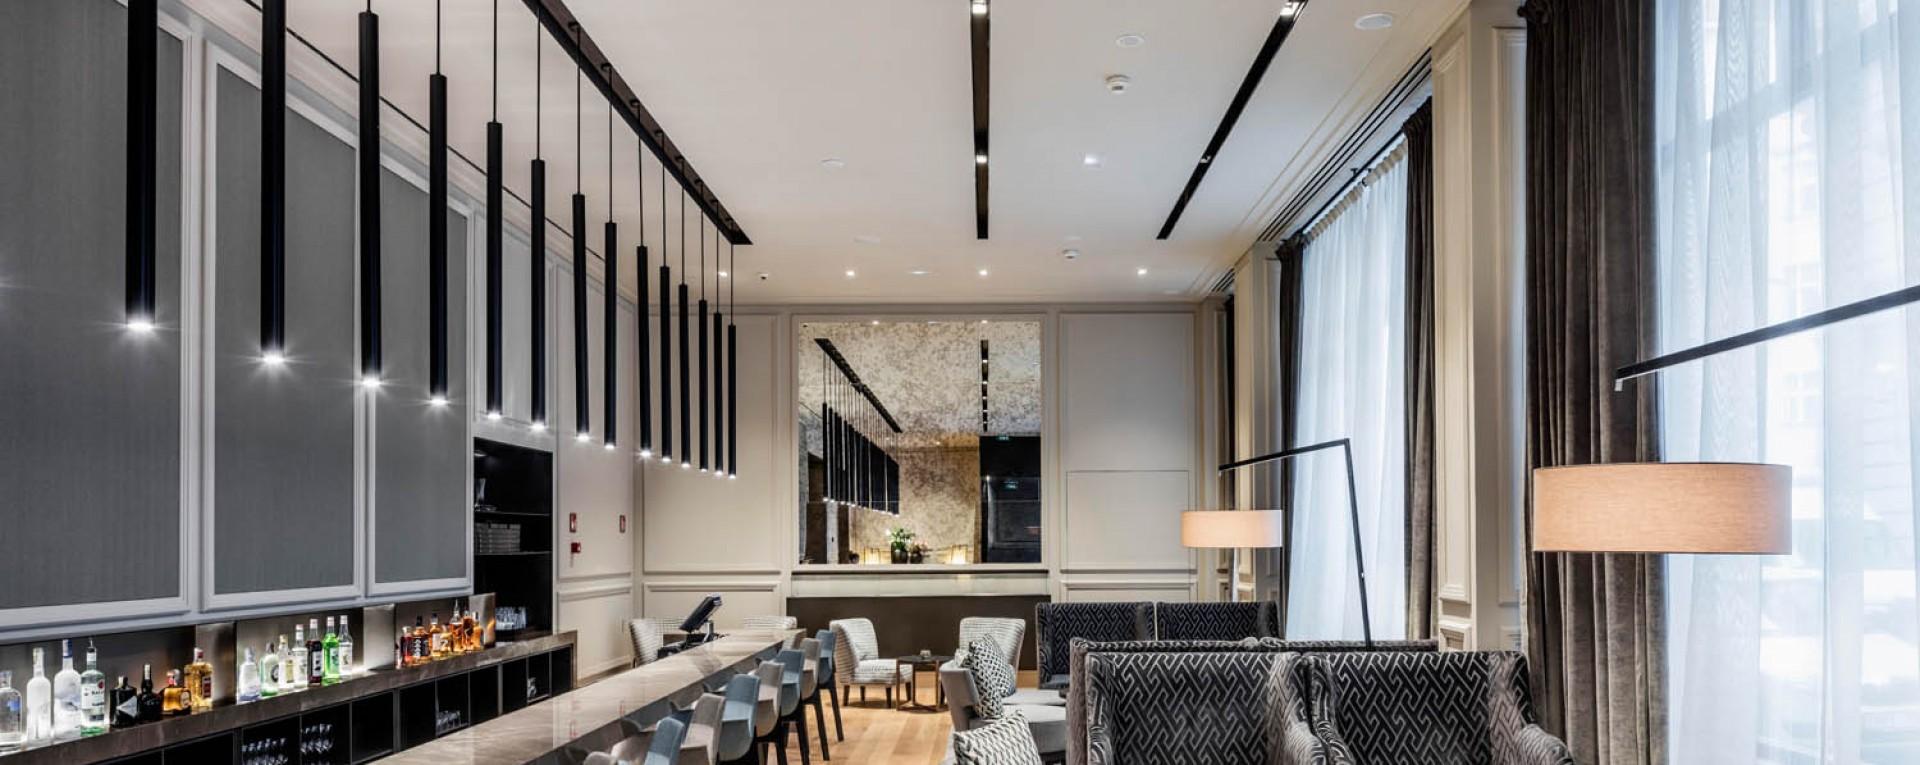 boho hotel prague czech republic europe luxury short breaks kirker holidays kirker holidays. Black Bedroom Furniture Sets. Home Design Ideas